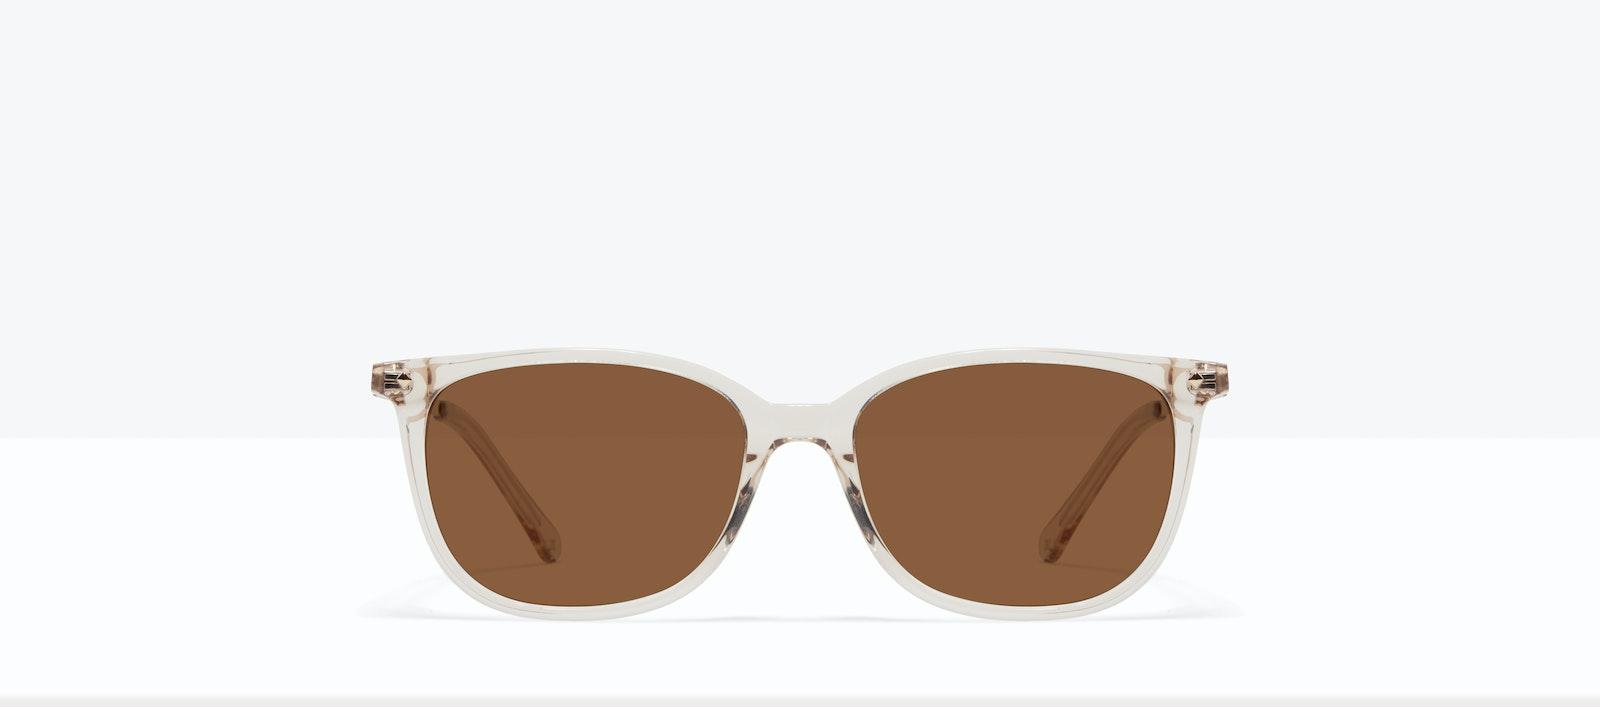 Affordable Fashion Glasses Rectangle Square Sunglasses Women Refine S Blond Front